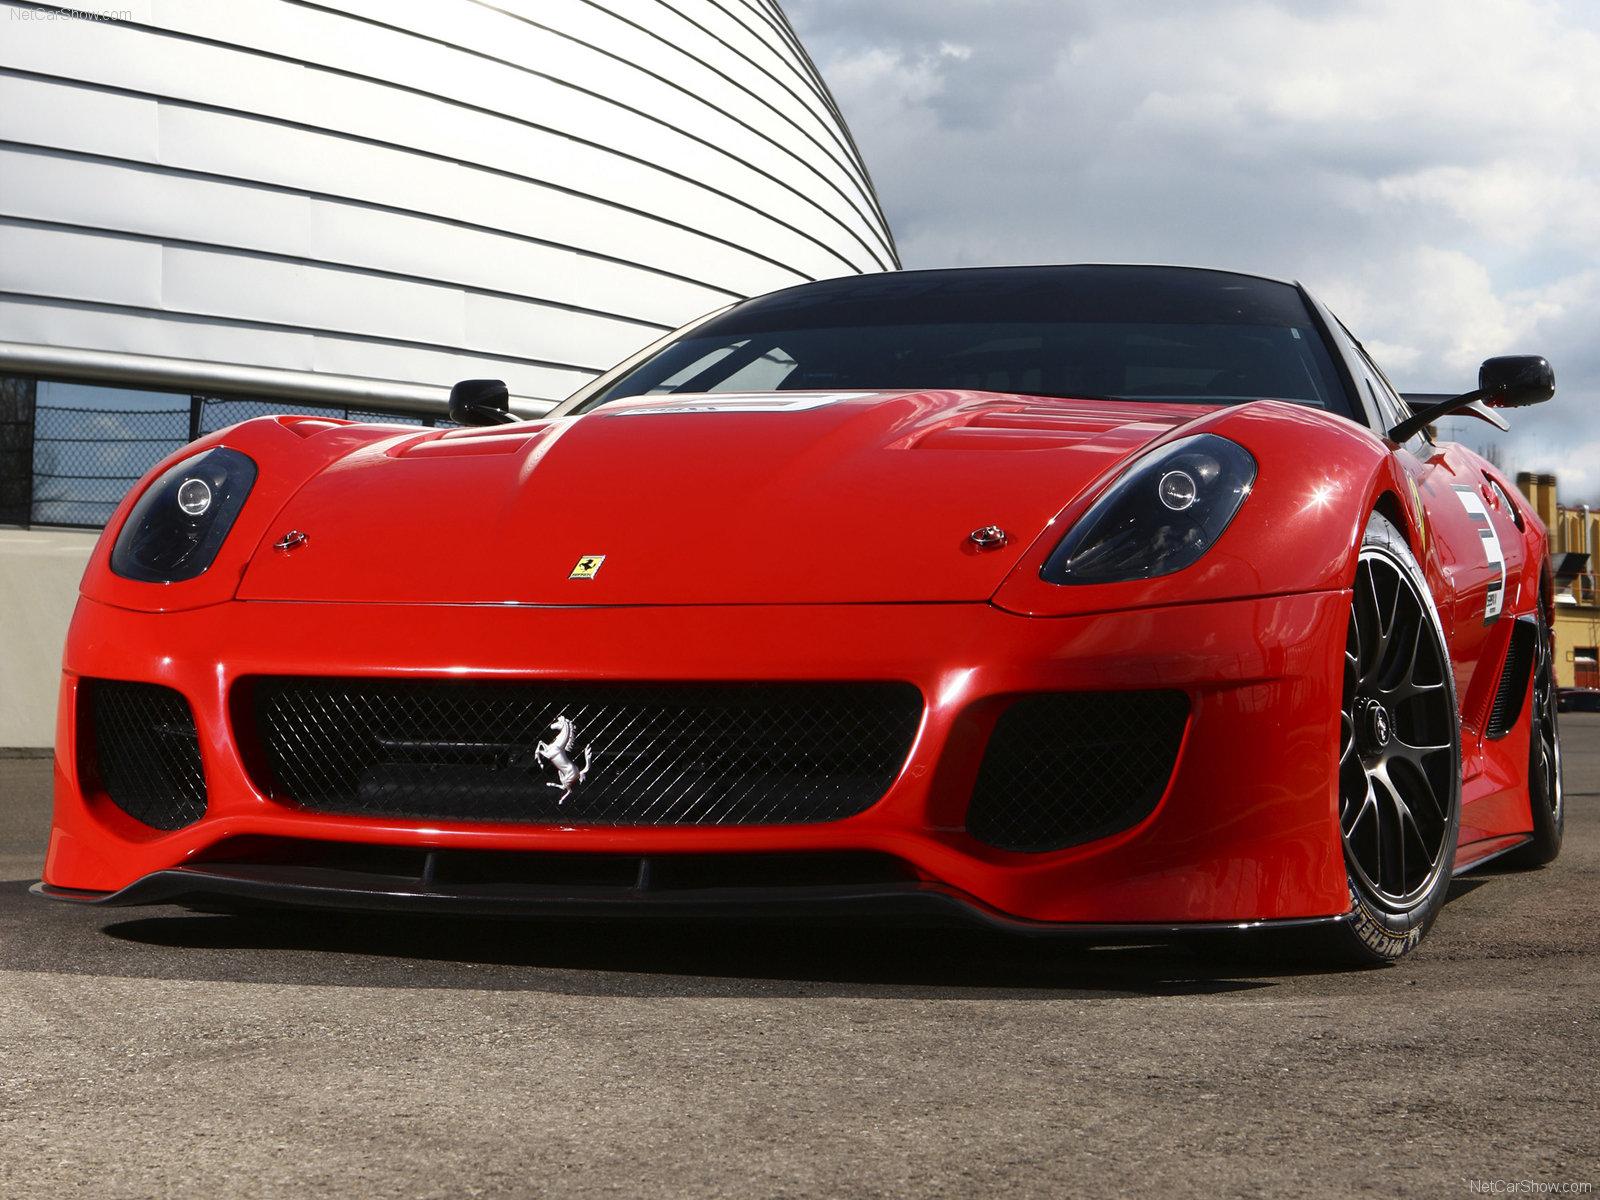 http://1.bp.blogspot.com/-4WZ3pIe29lg/Tne9gx7FM_I/AAAAAAAACKE/SvkxOg5v7YI/s1600/Ferrari-599XX_2010_1600x1200_wallpaper_03.jpg